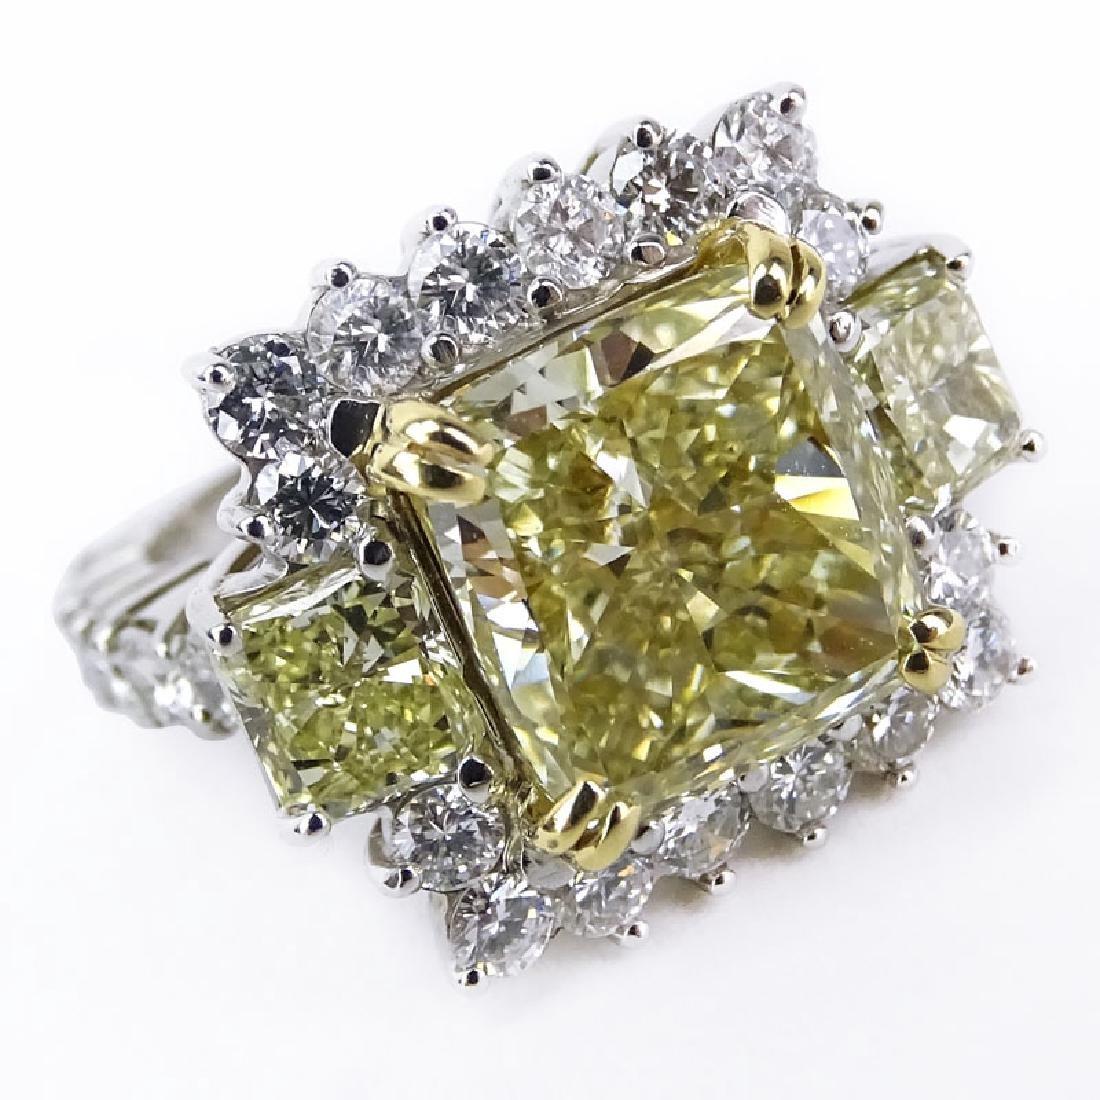 Approx. 8.71 Carat TW Fancy Yellow Diamond, White